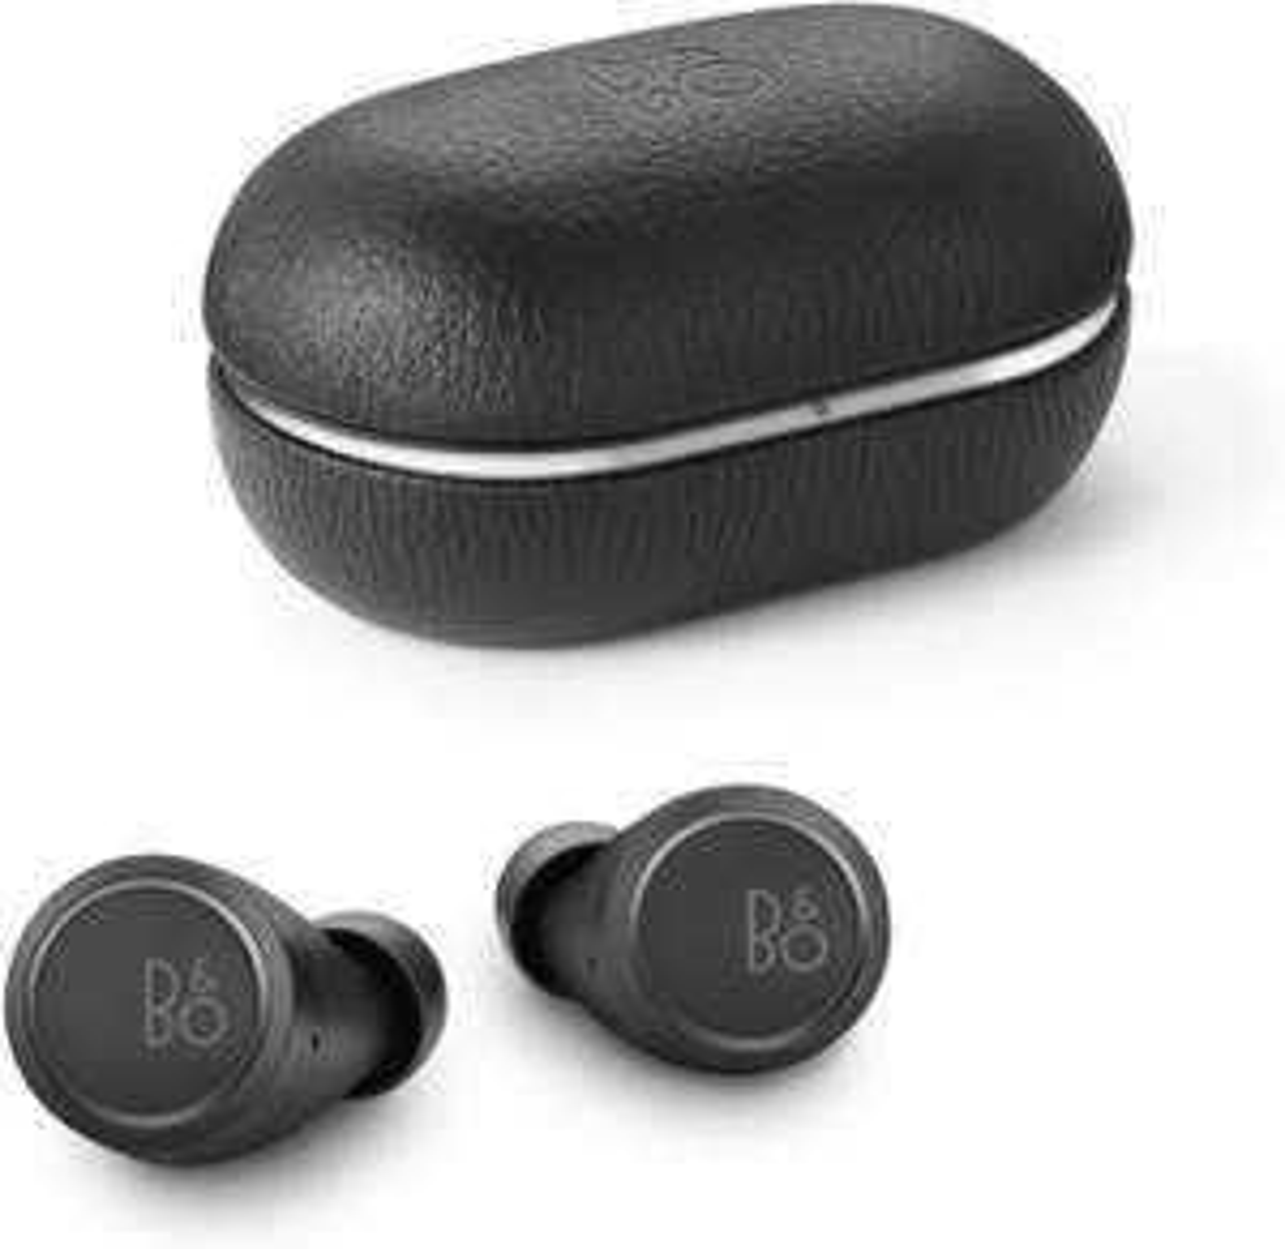 Bang & Olufsen Beoplay E8 3.0 True Wireless In-Ear-Kopfhörer (35h Akku mit Leder-Ladecase, Touch-Control, Mikro, Bluetooth 5.1, aptX, USB-C)